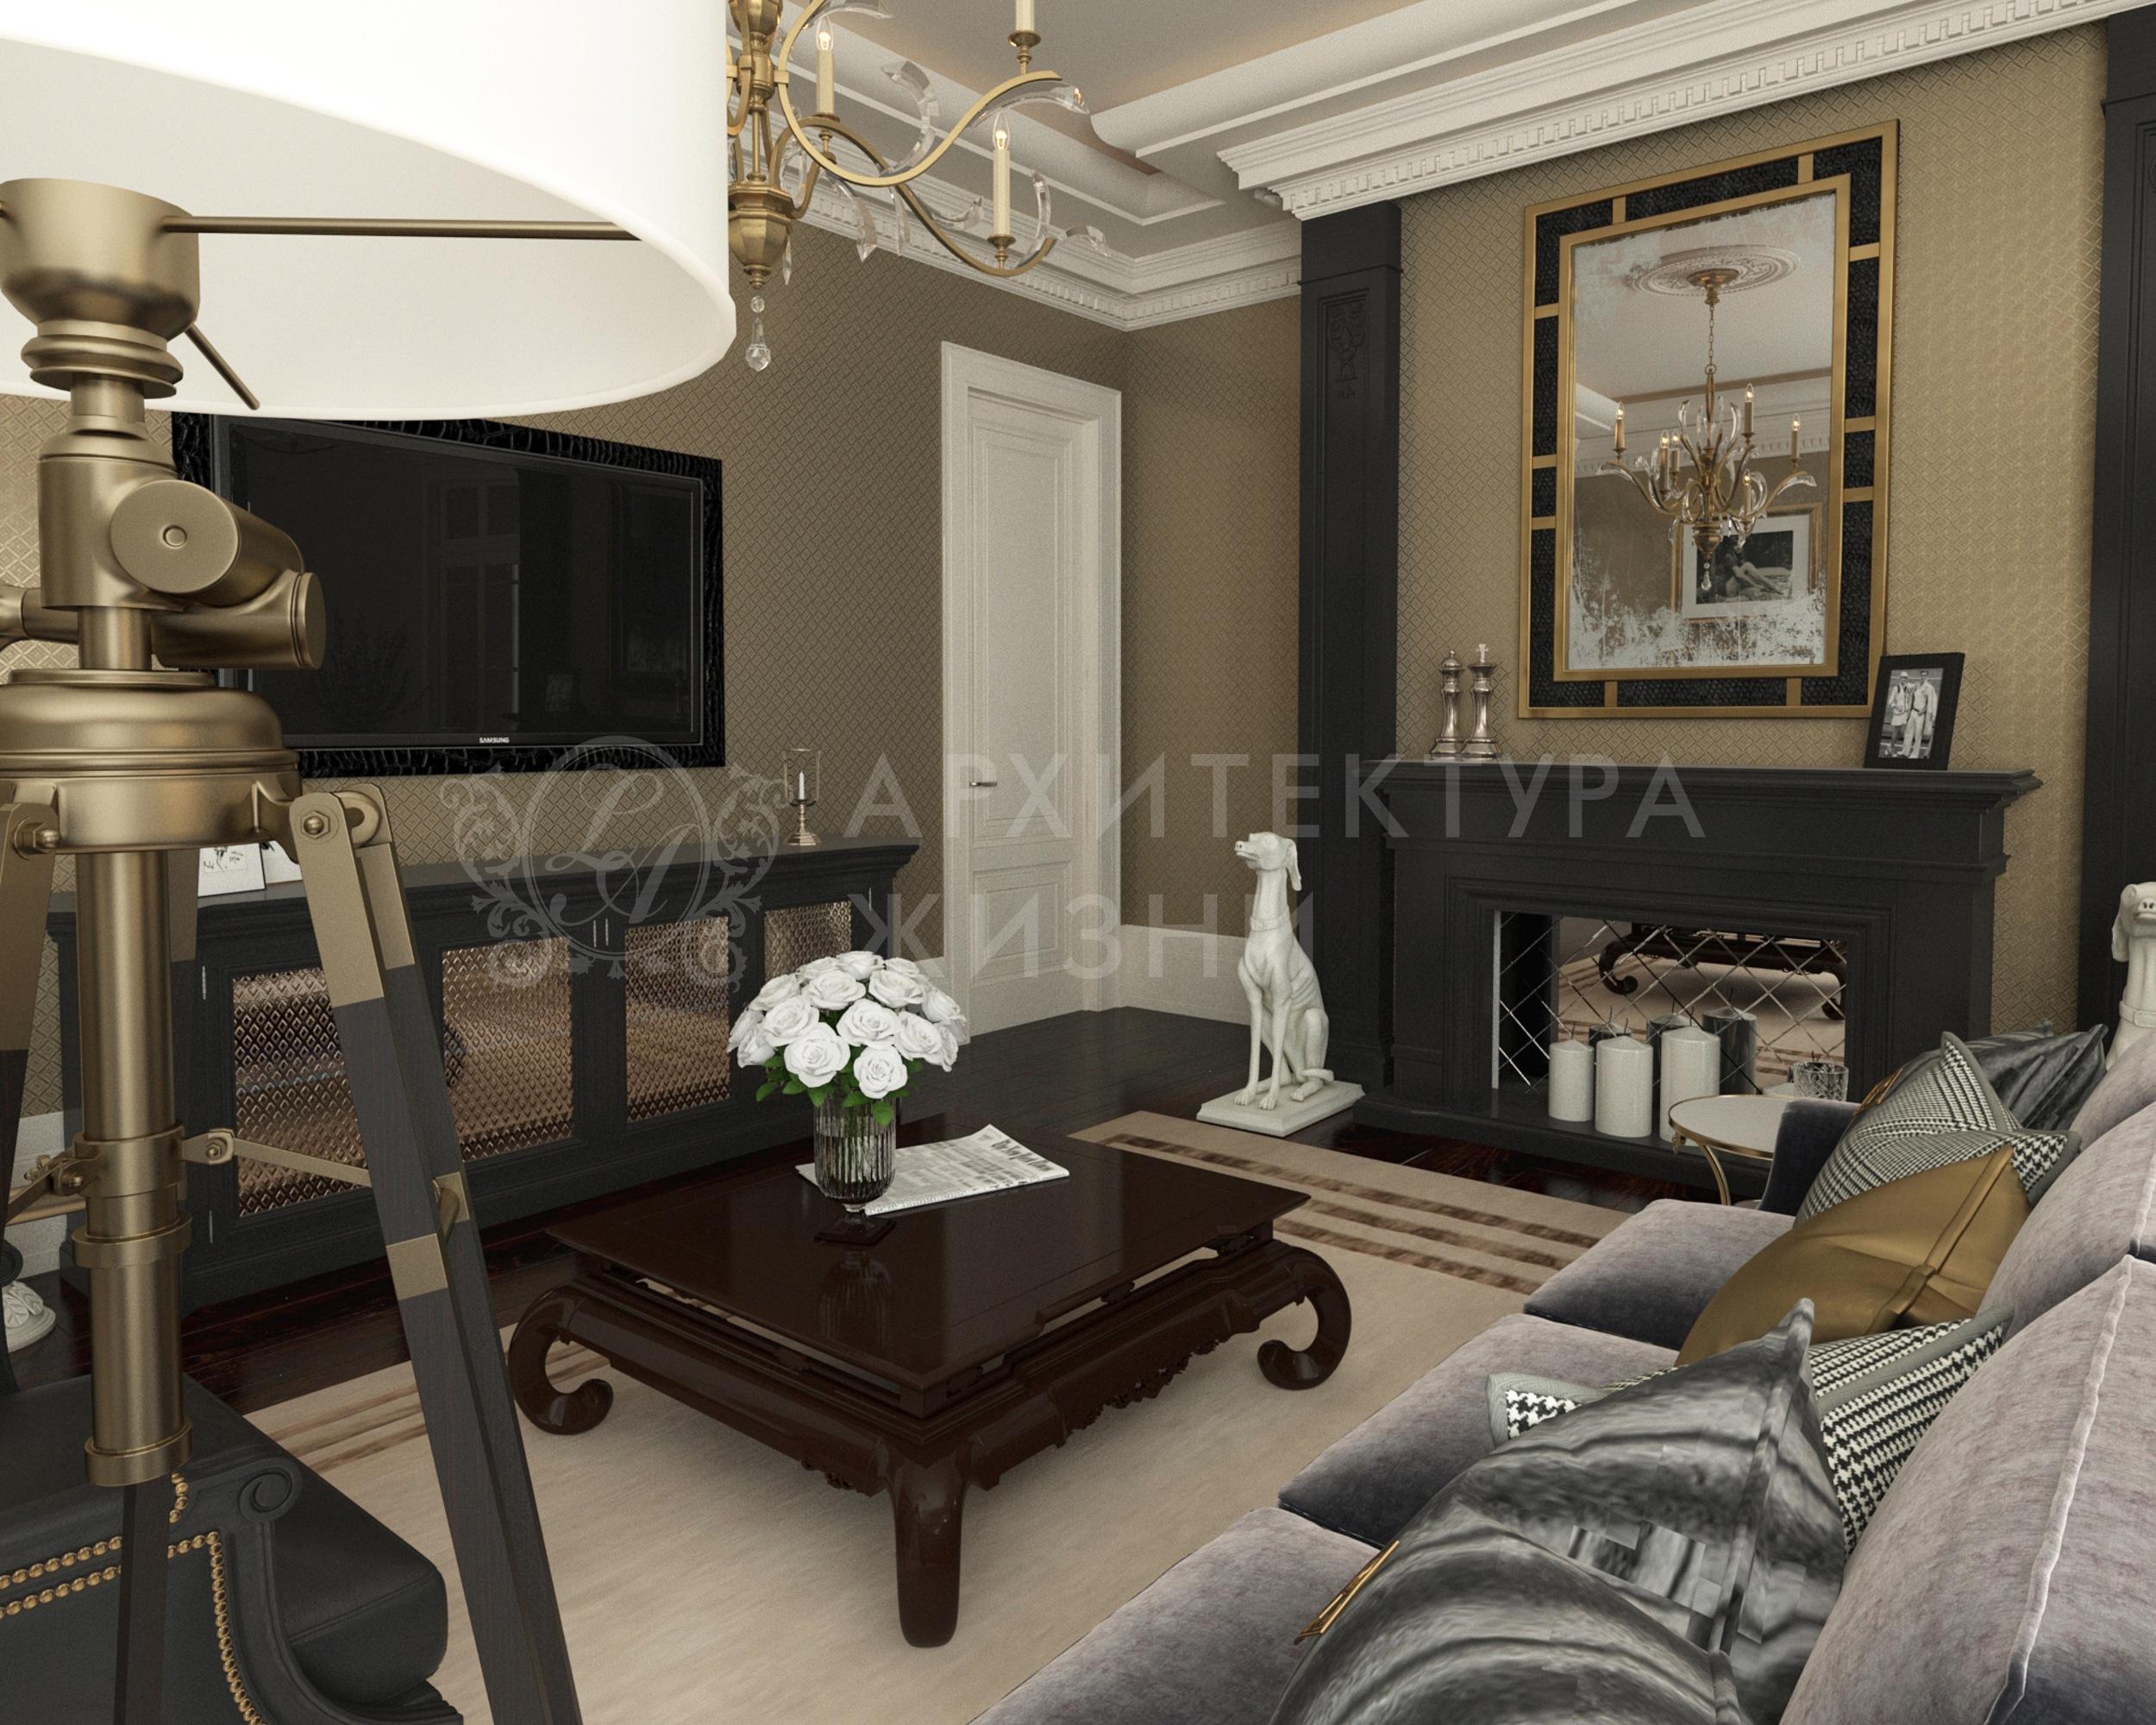 arbat_stars_marriott_apartment2.jpg